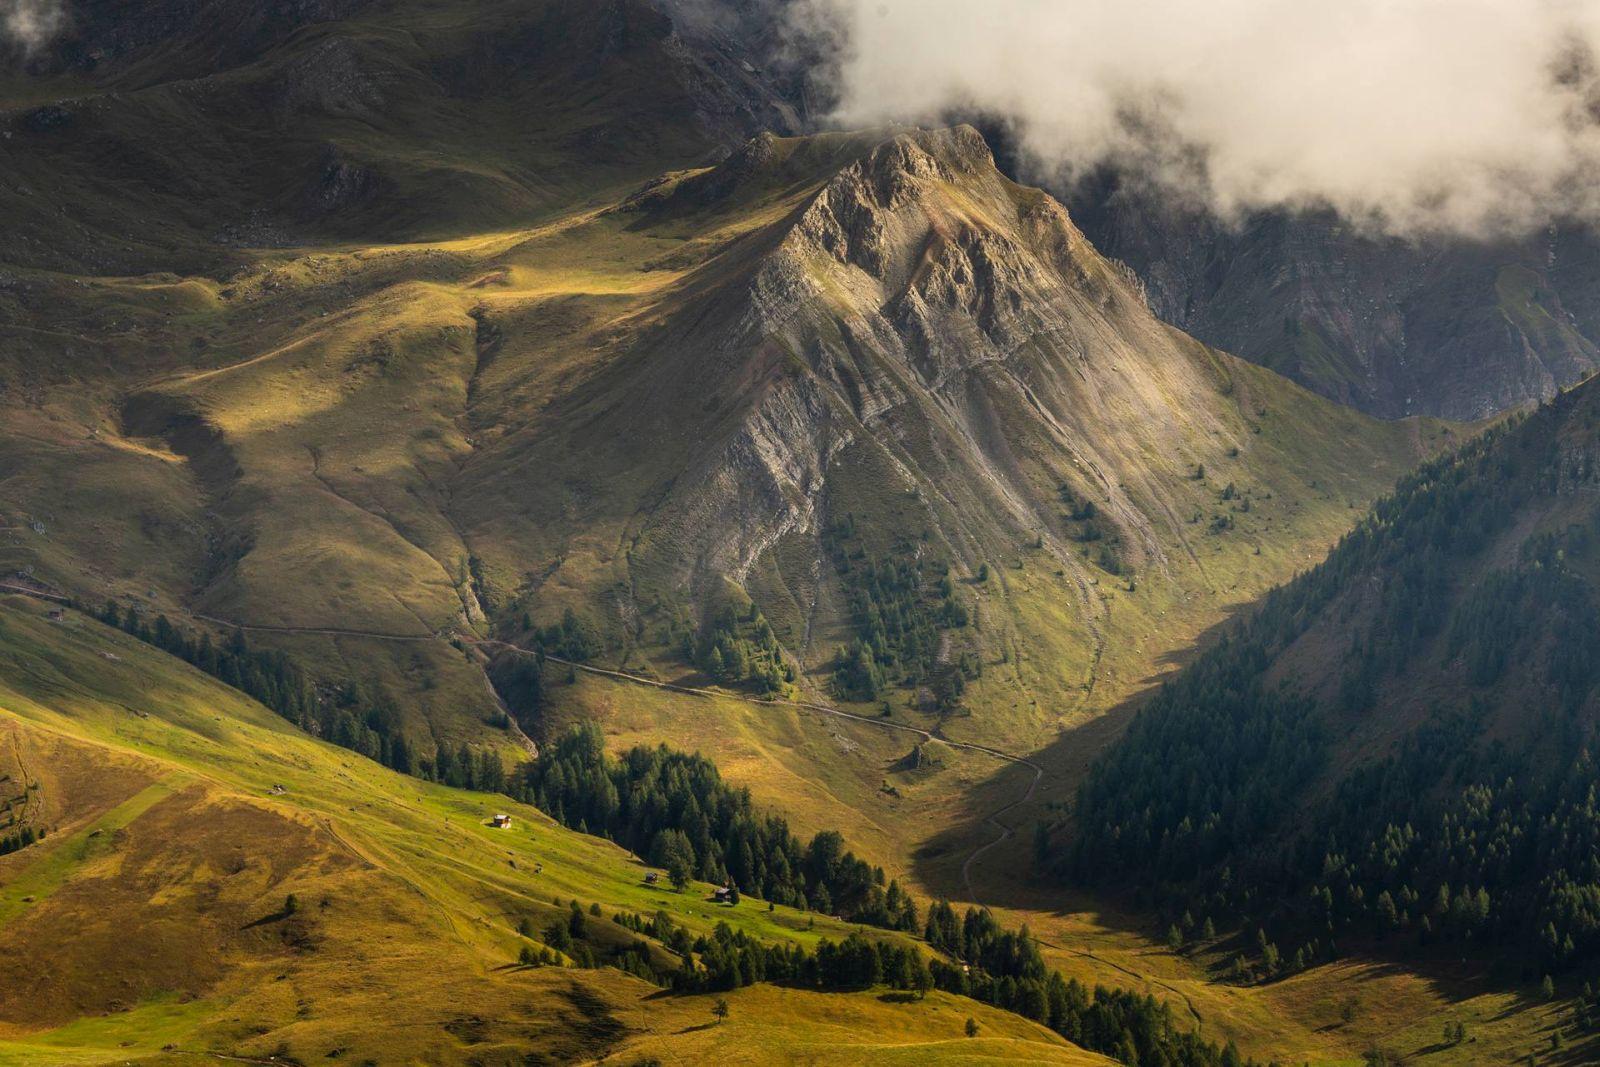 beautiful landscape photography dolomites by mikolaj gospodarek